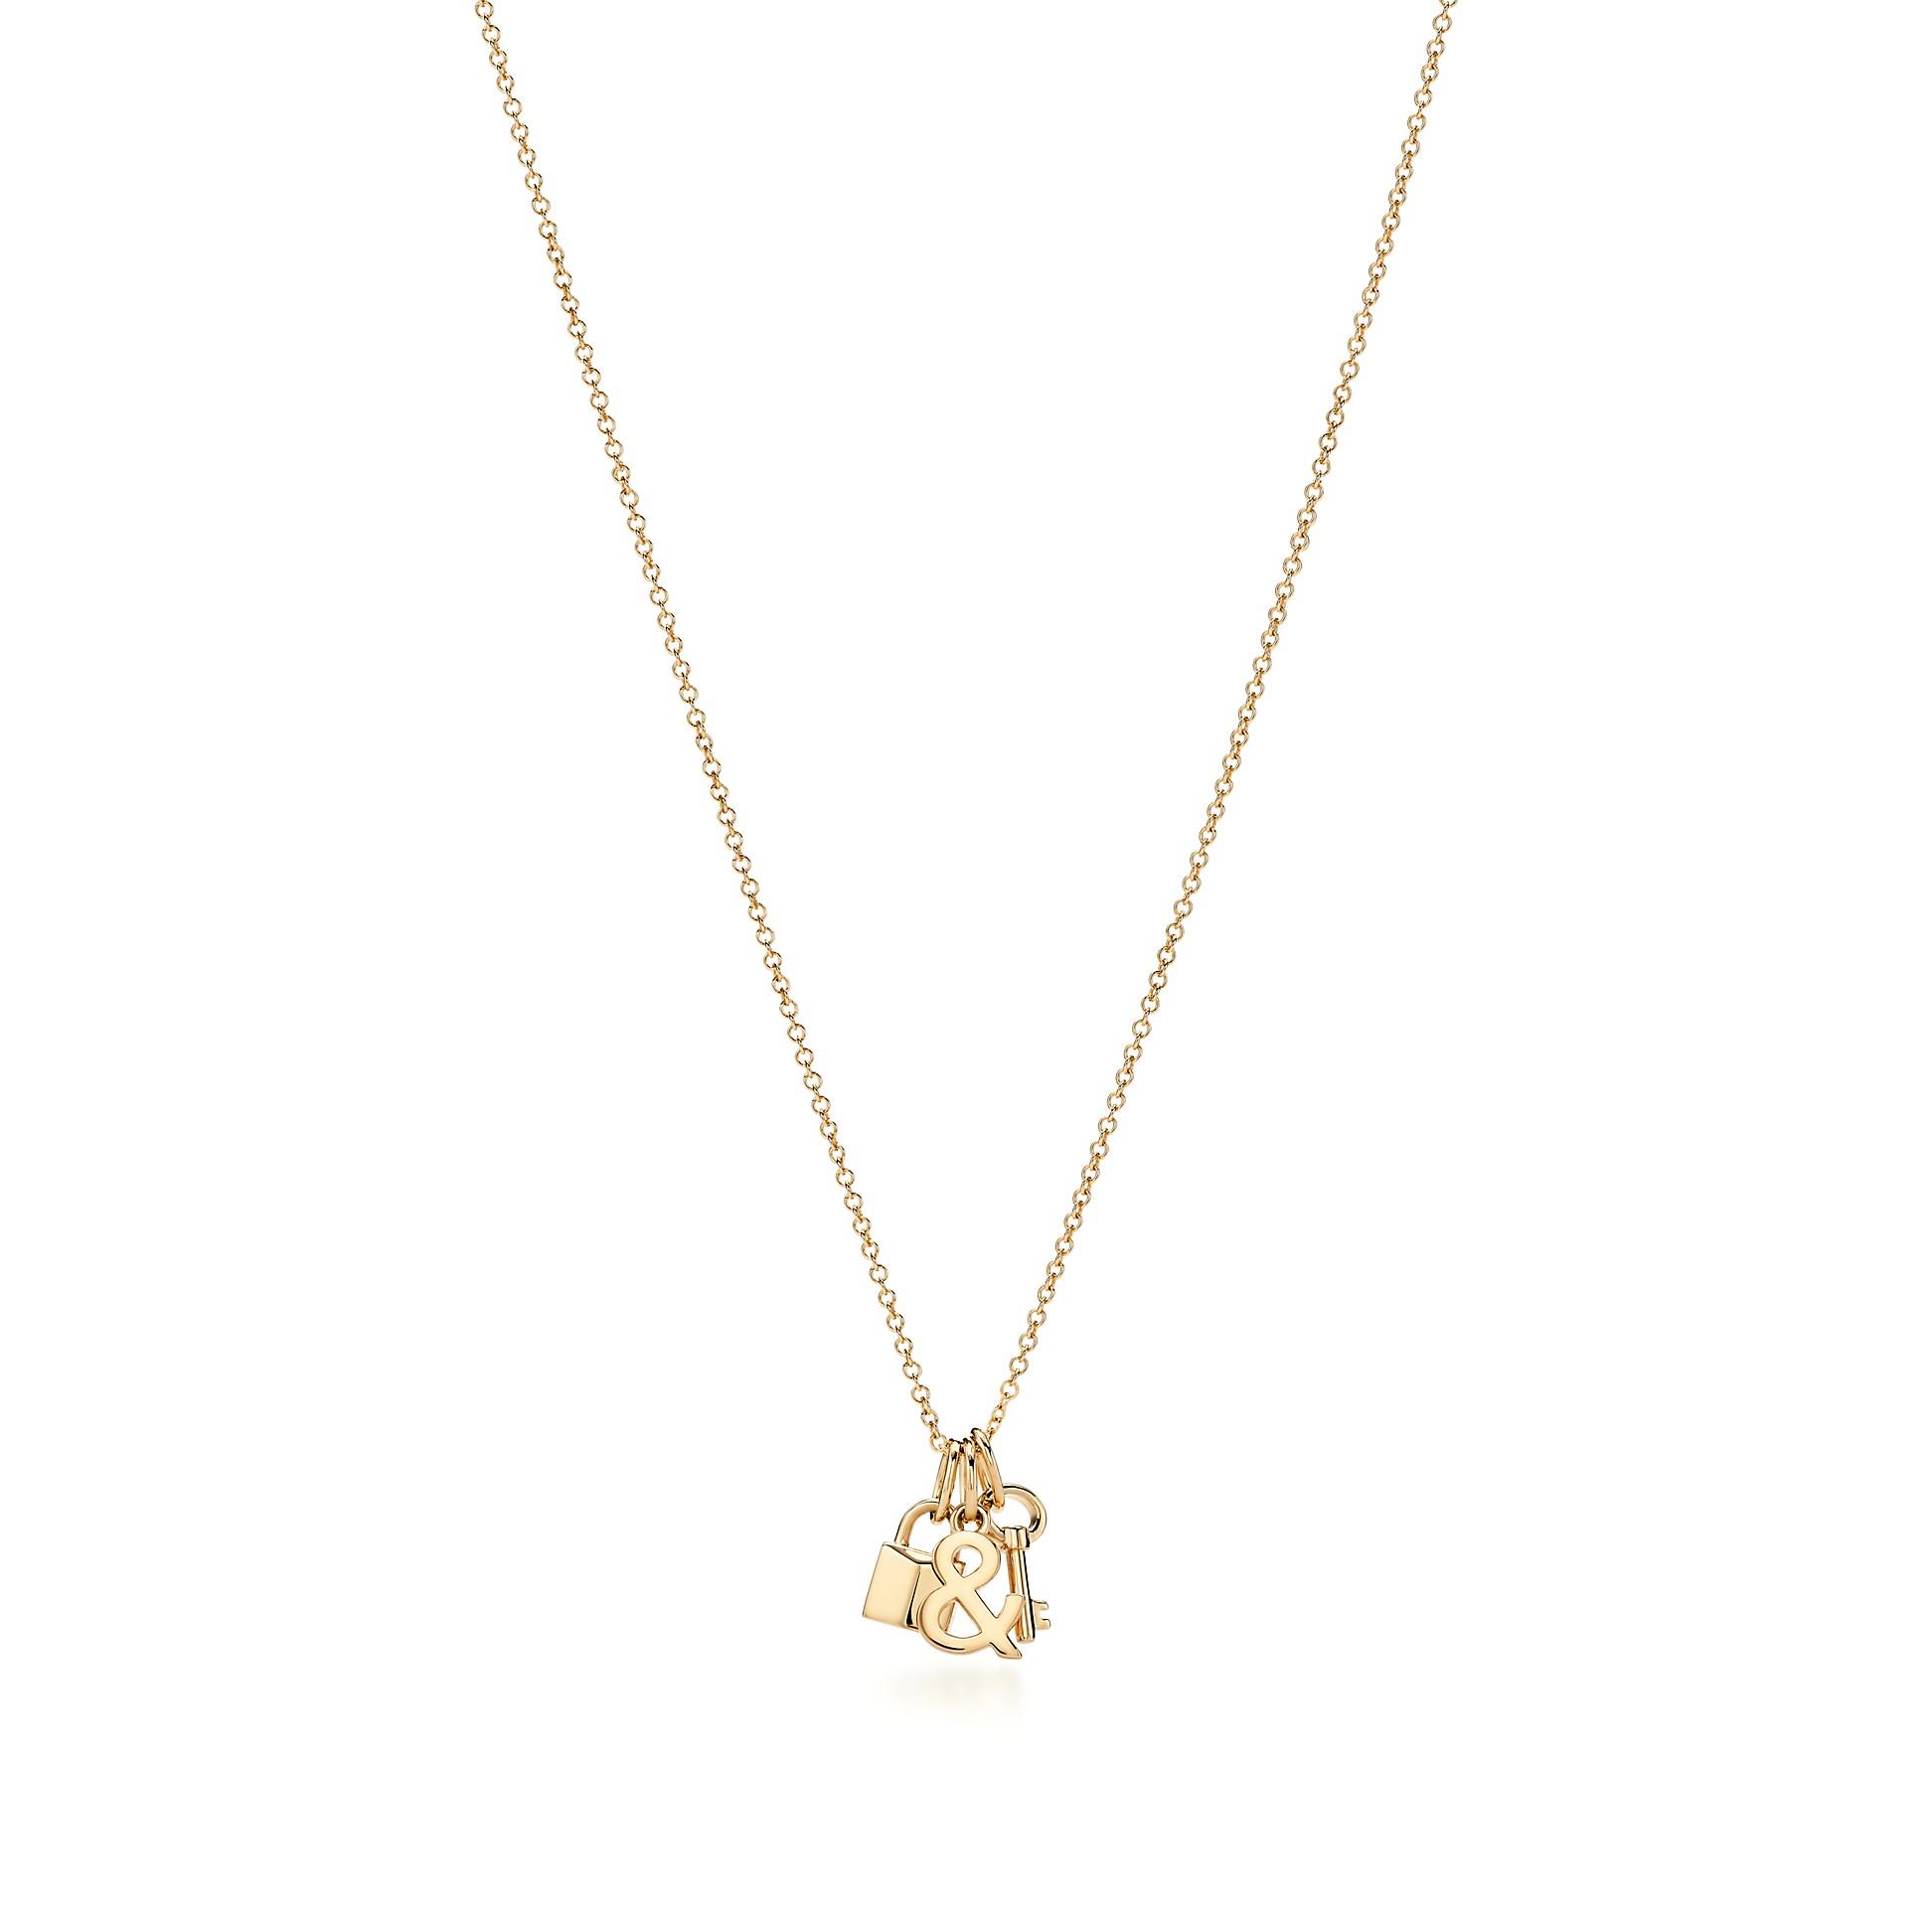 Tiffany & Love        Lock And Key Pendant In 18k Gold by Tiffany & Love